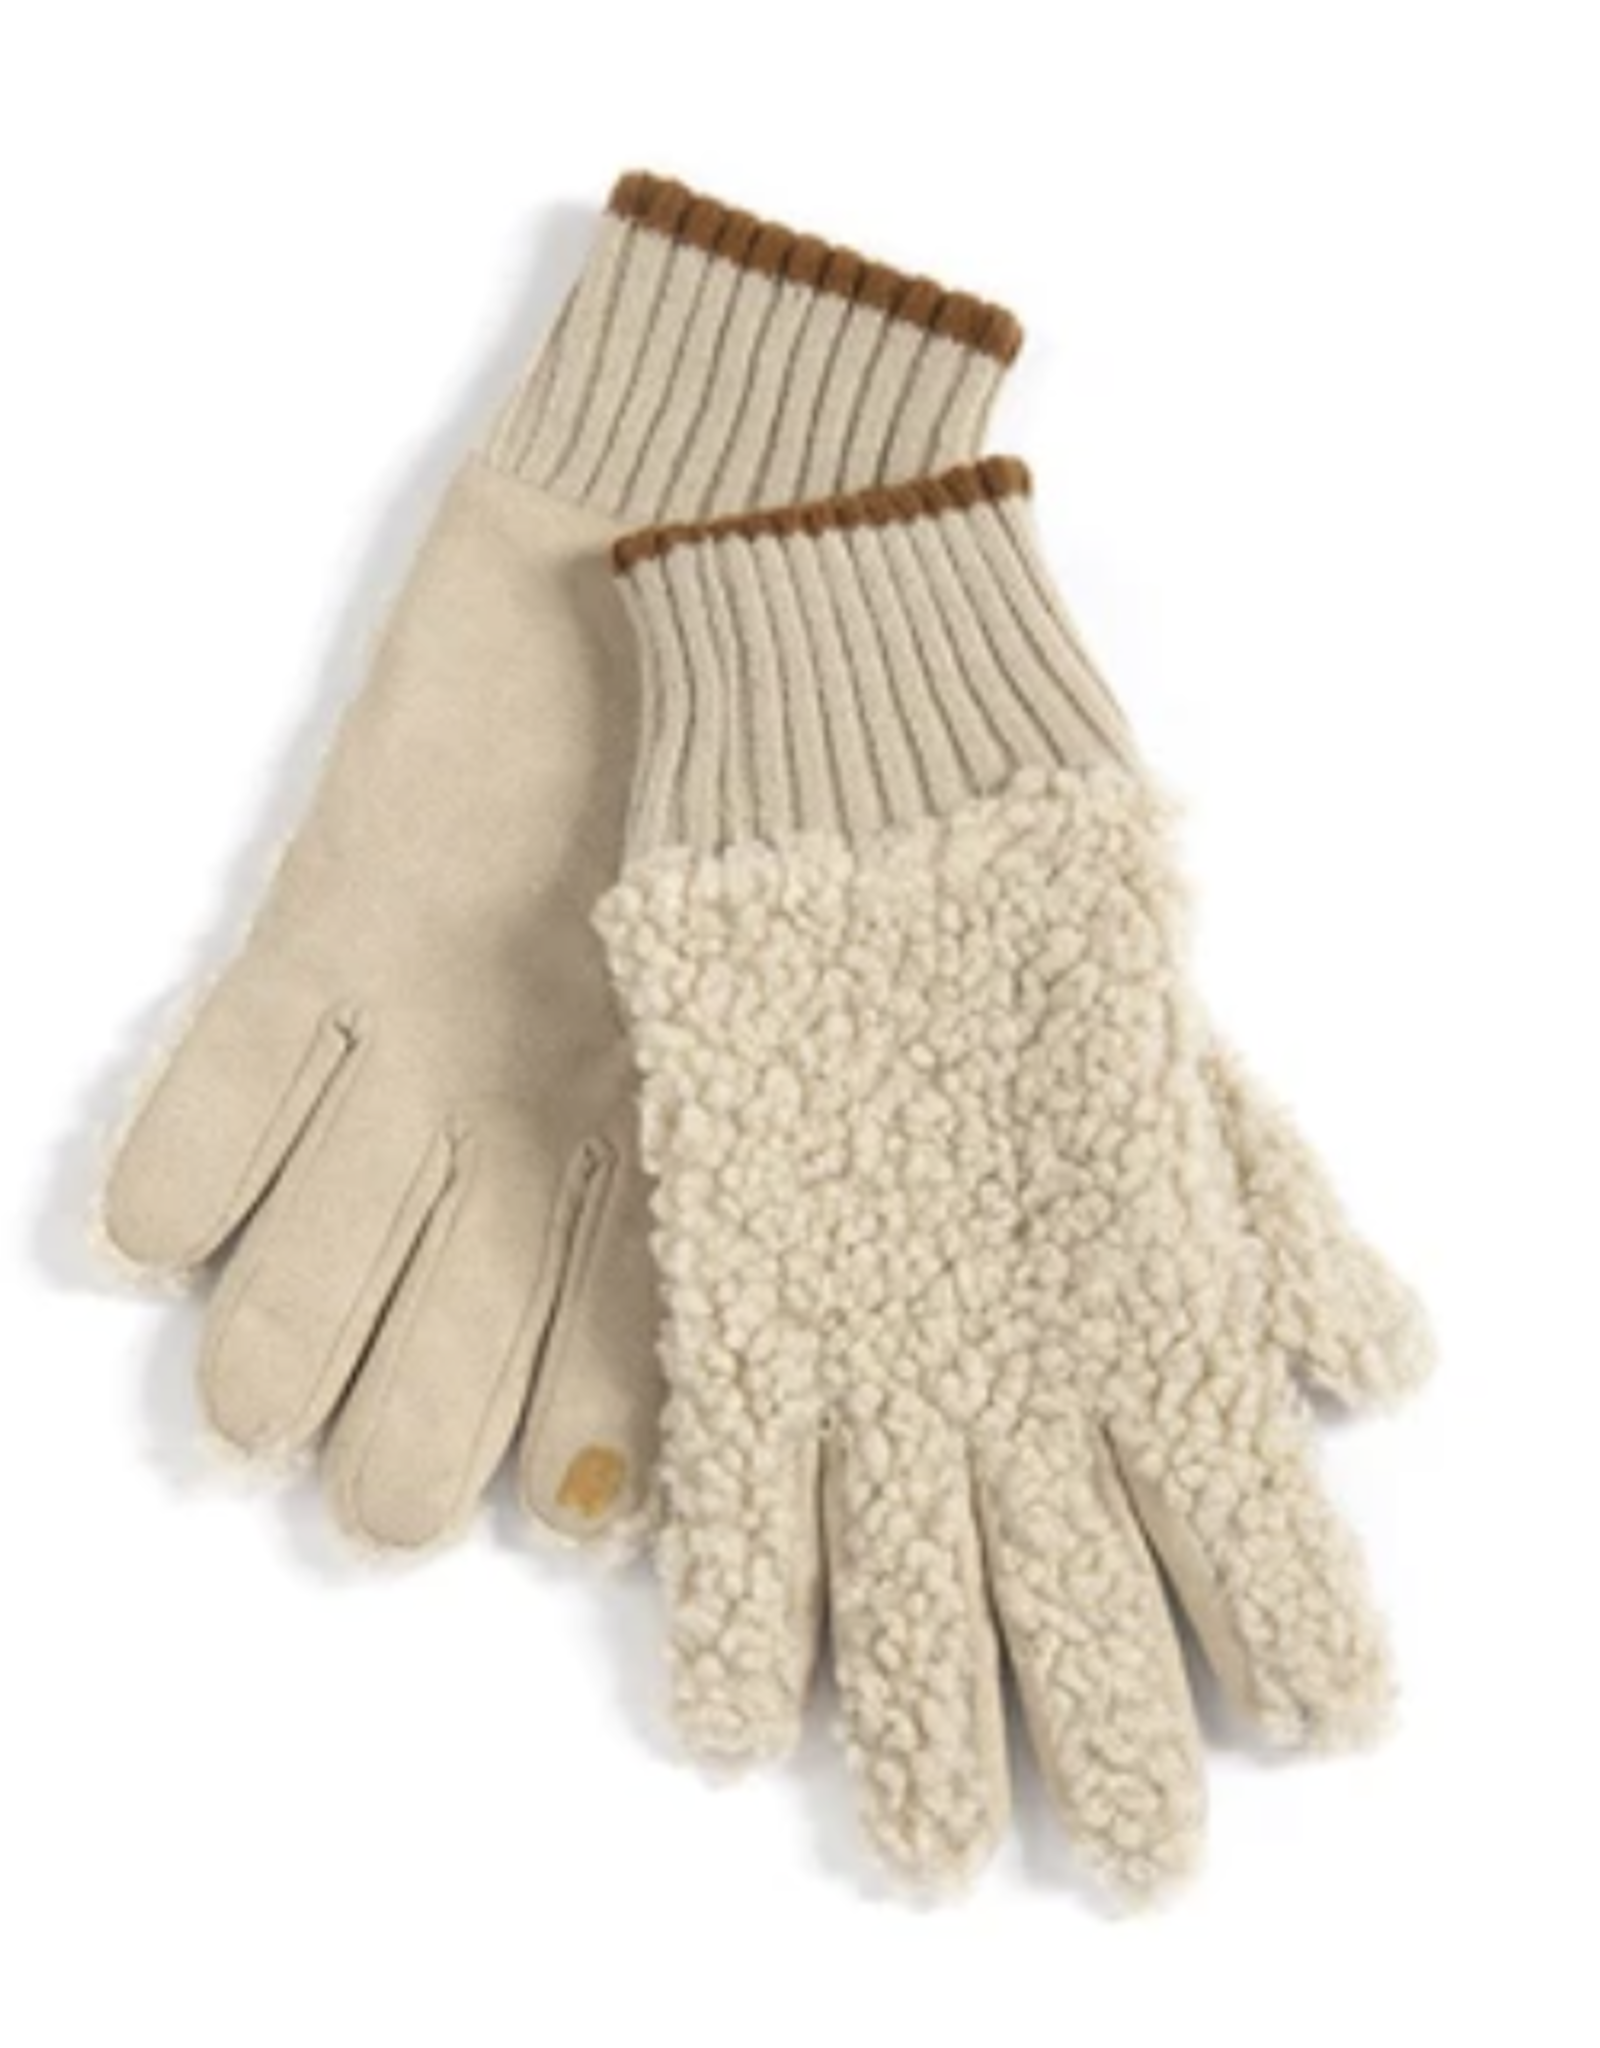 James Touchscreen Glove - Natural